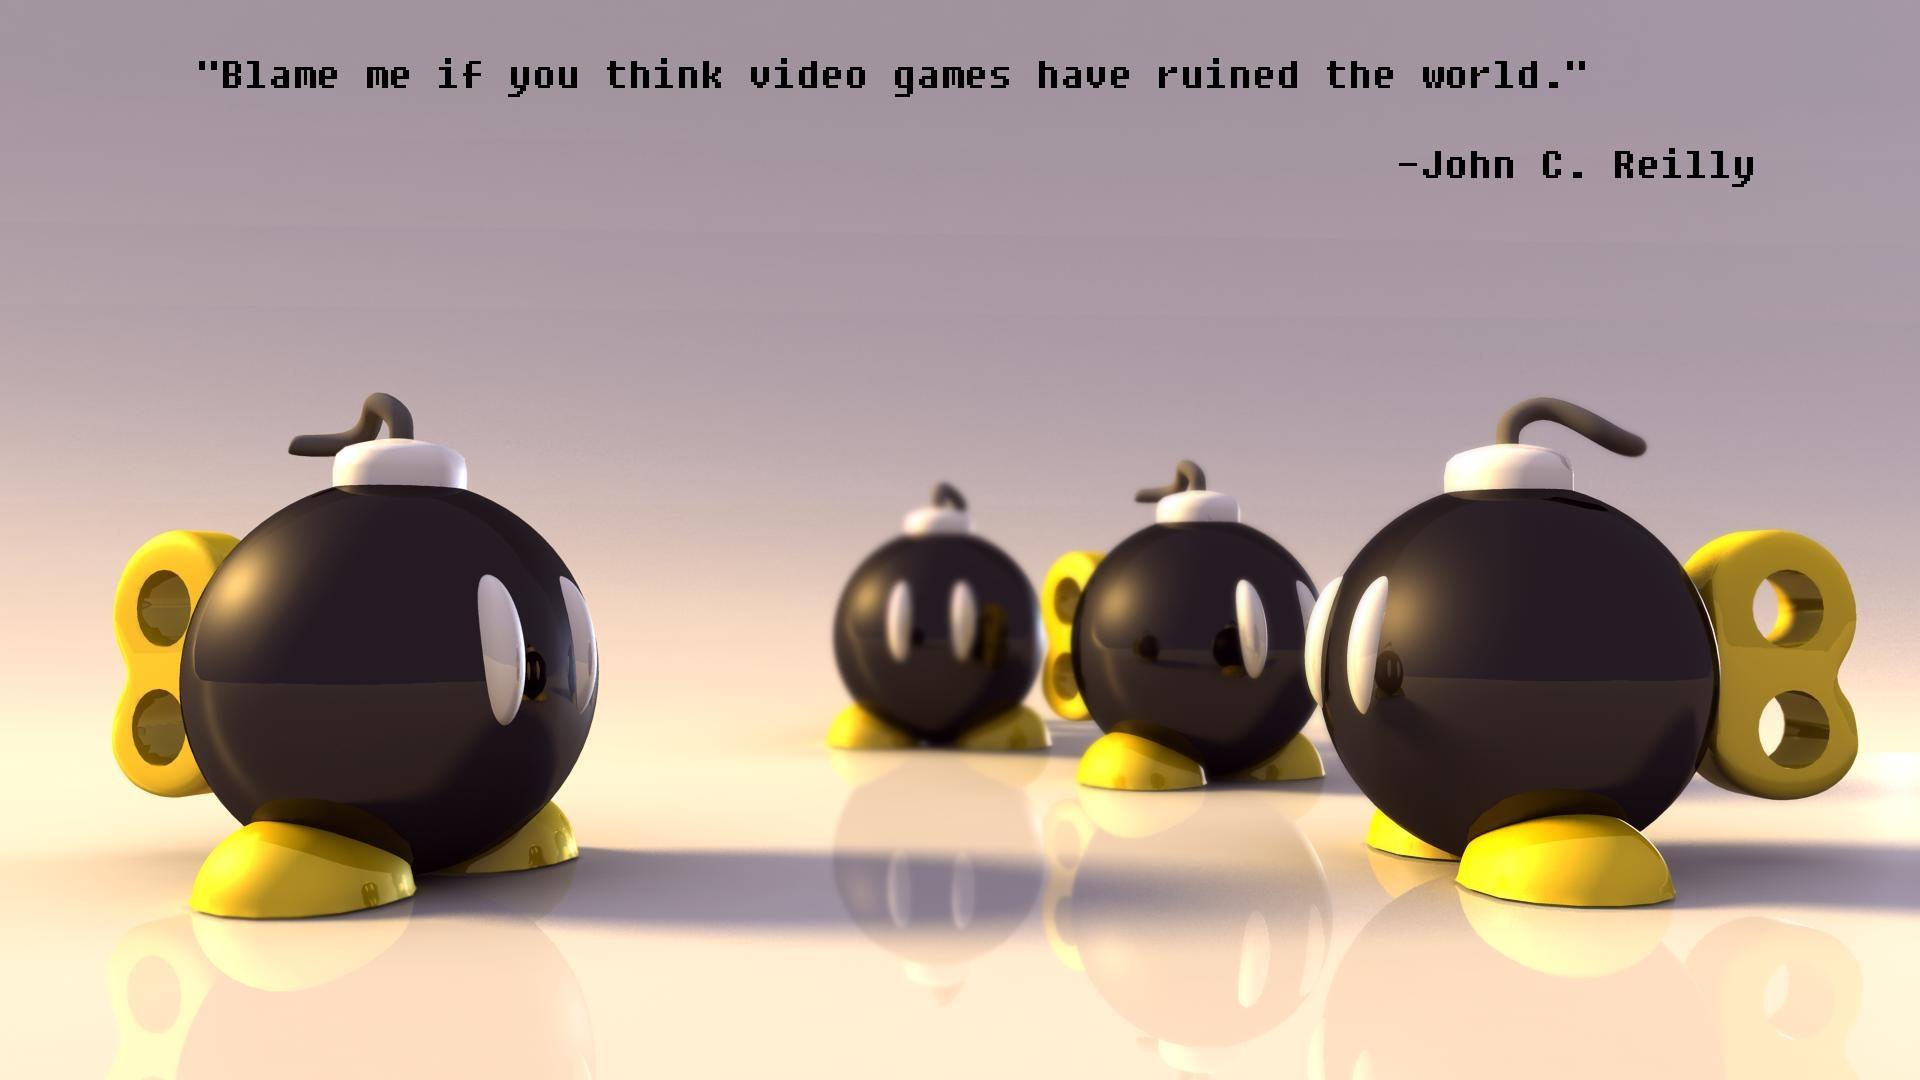 John C. Reilly's quote #2